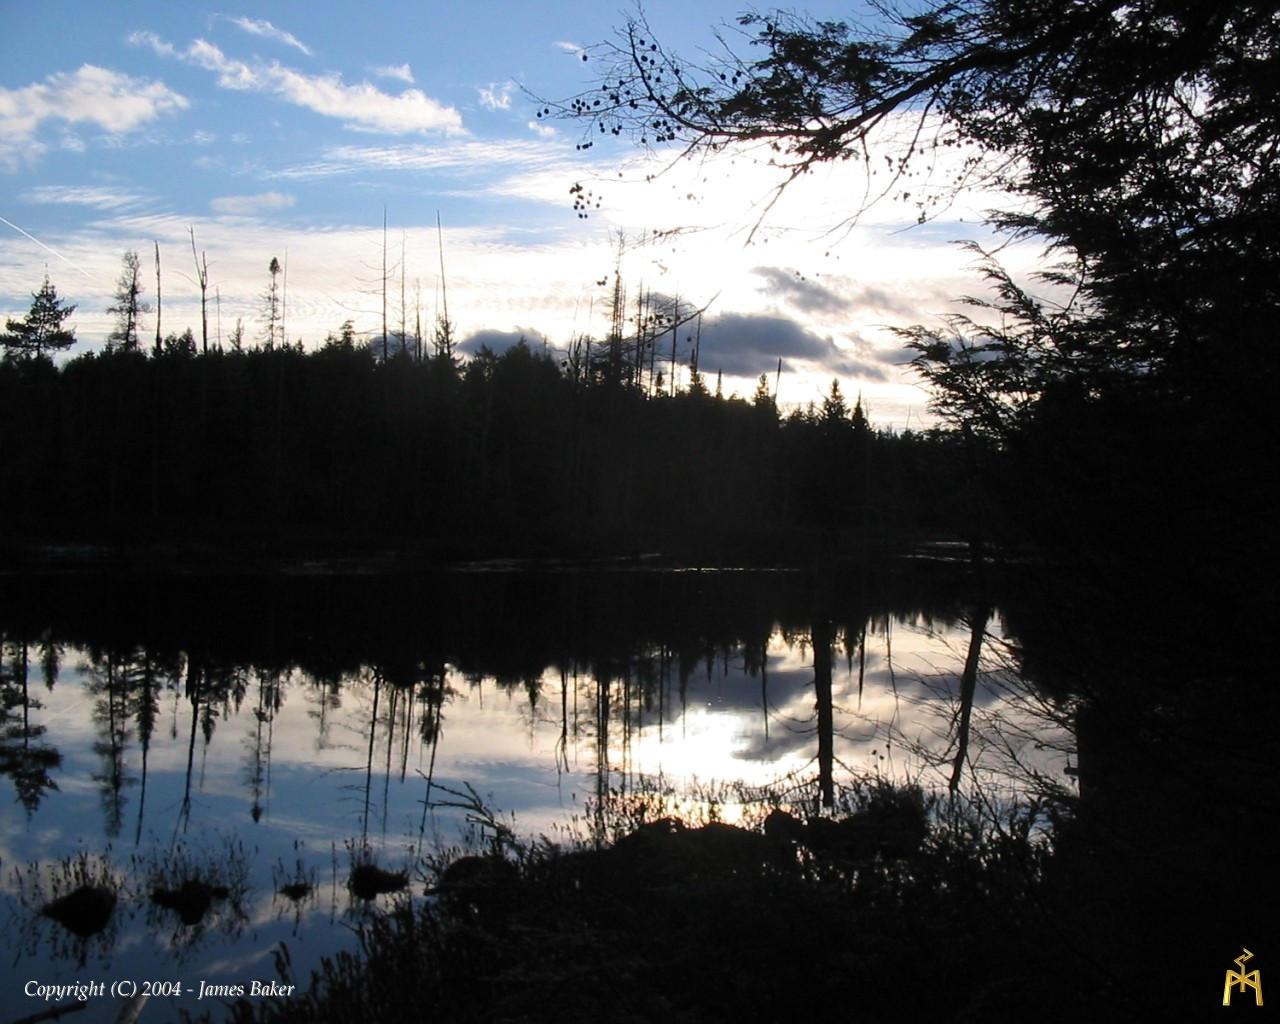 Wilderness Lake 1 - 1280x1024 by odhinnsrunes